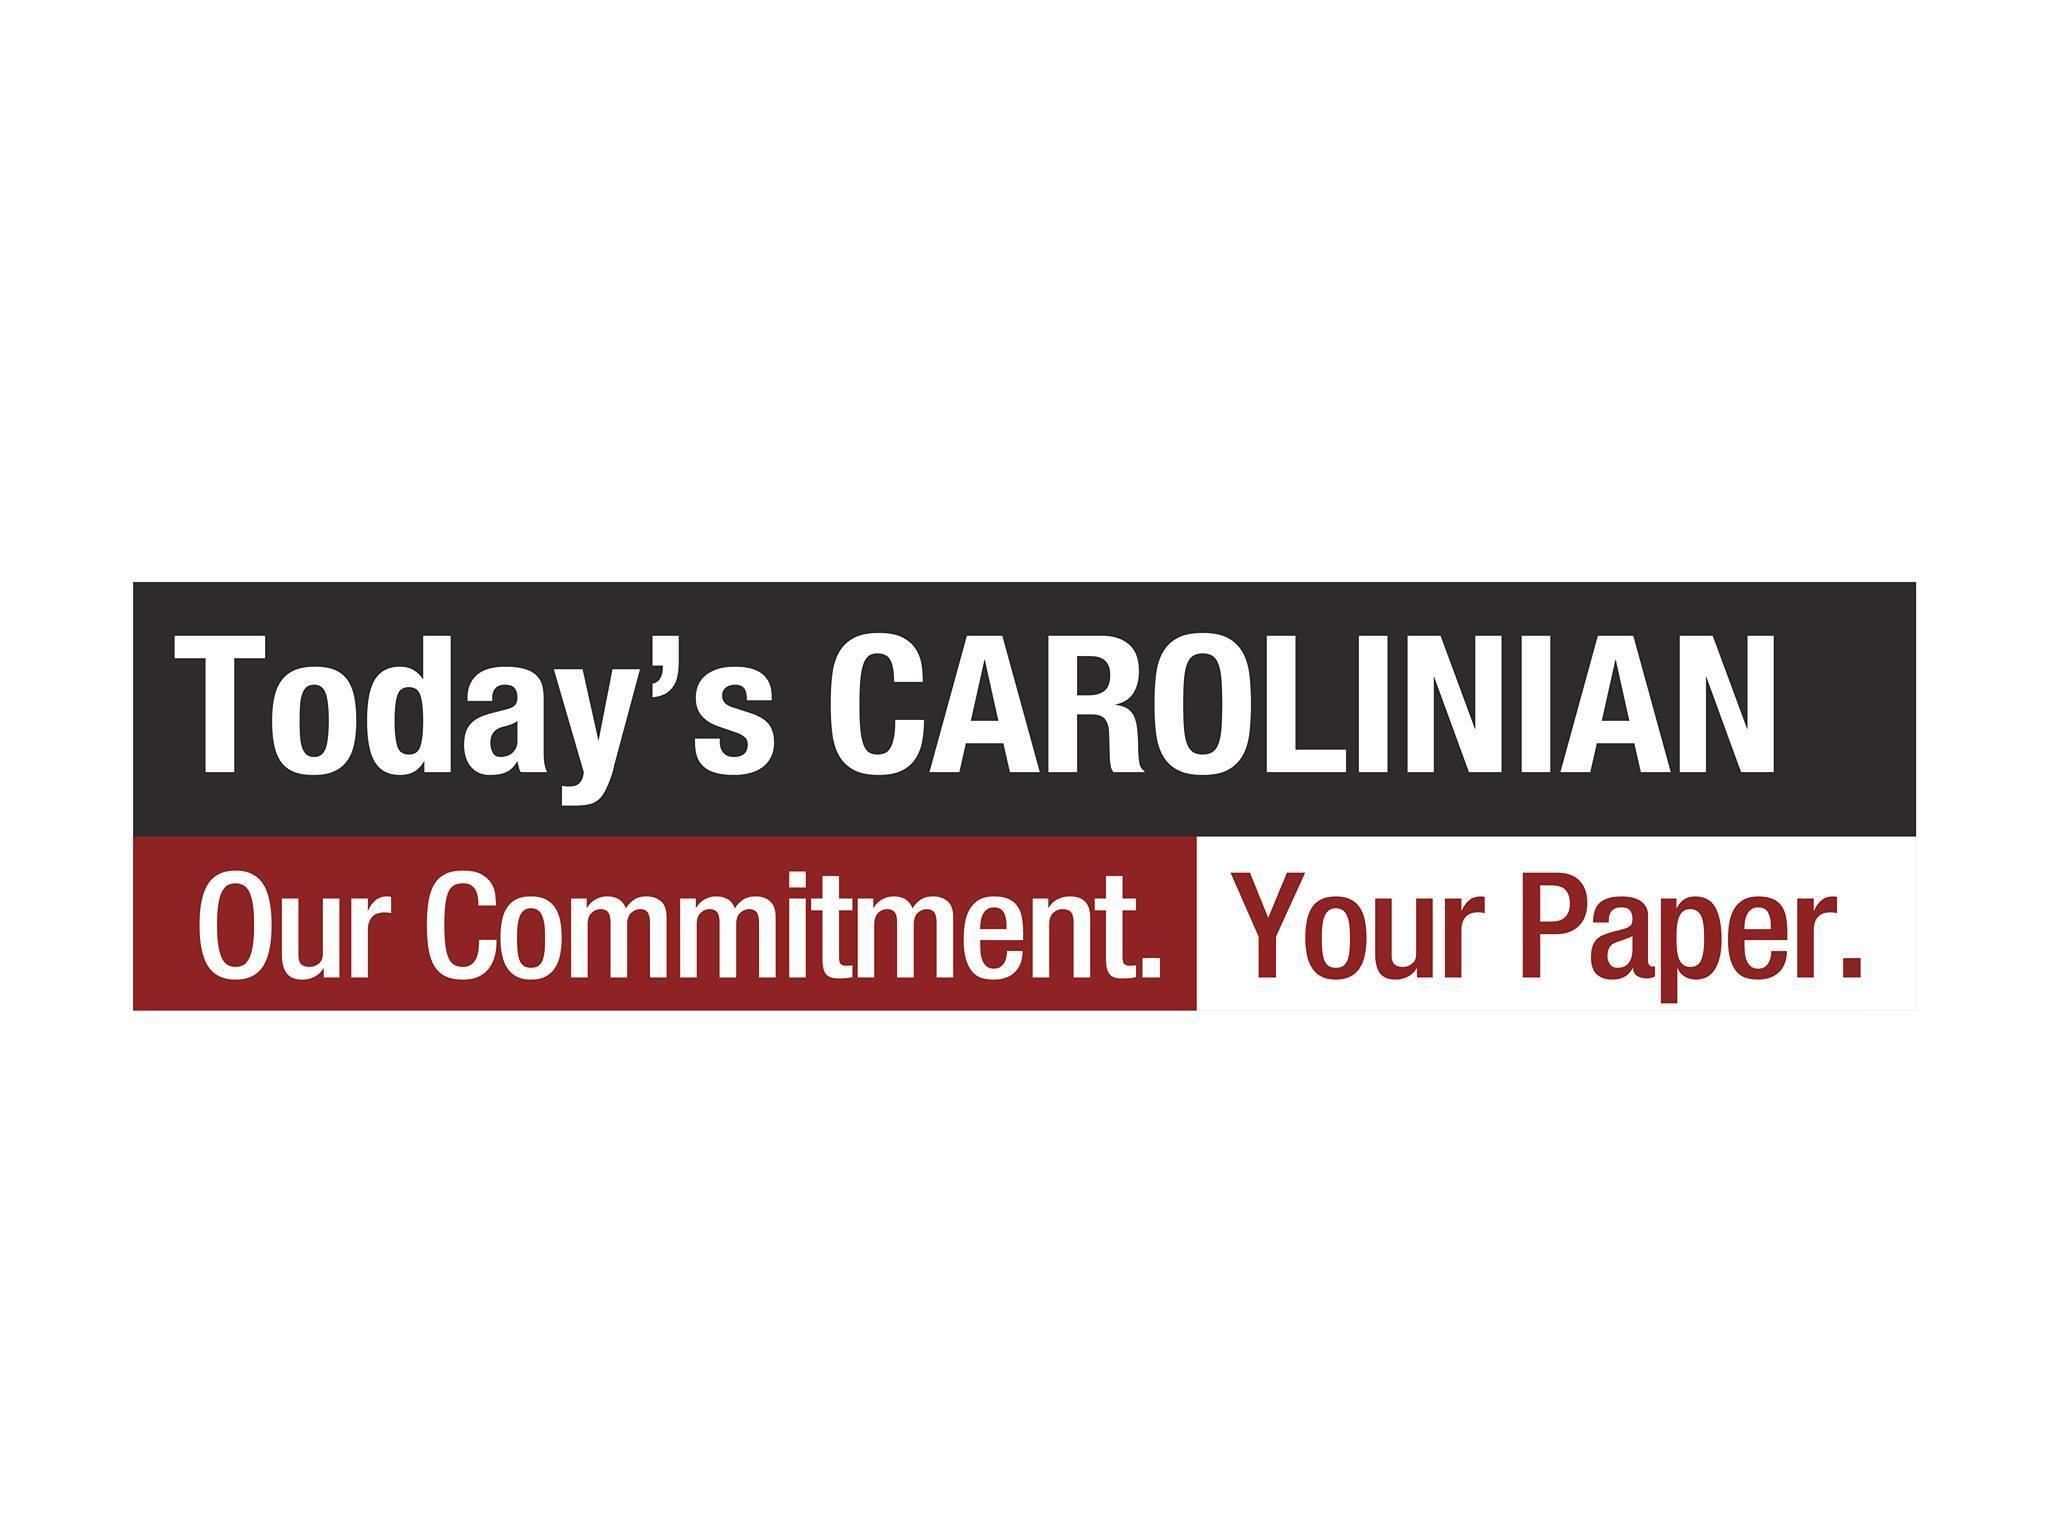 Today's Carolinian.jpg